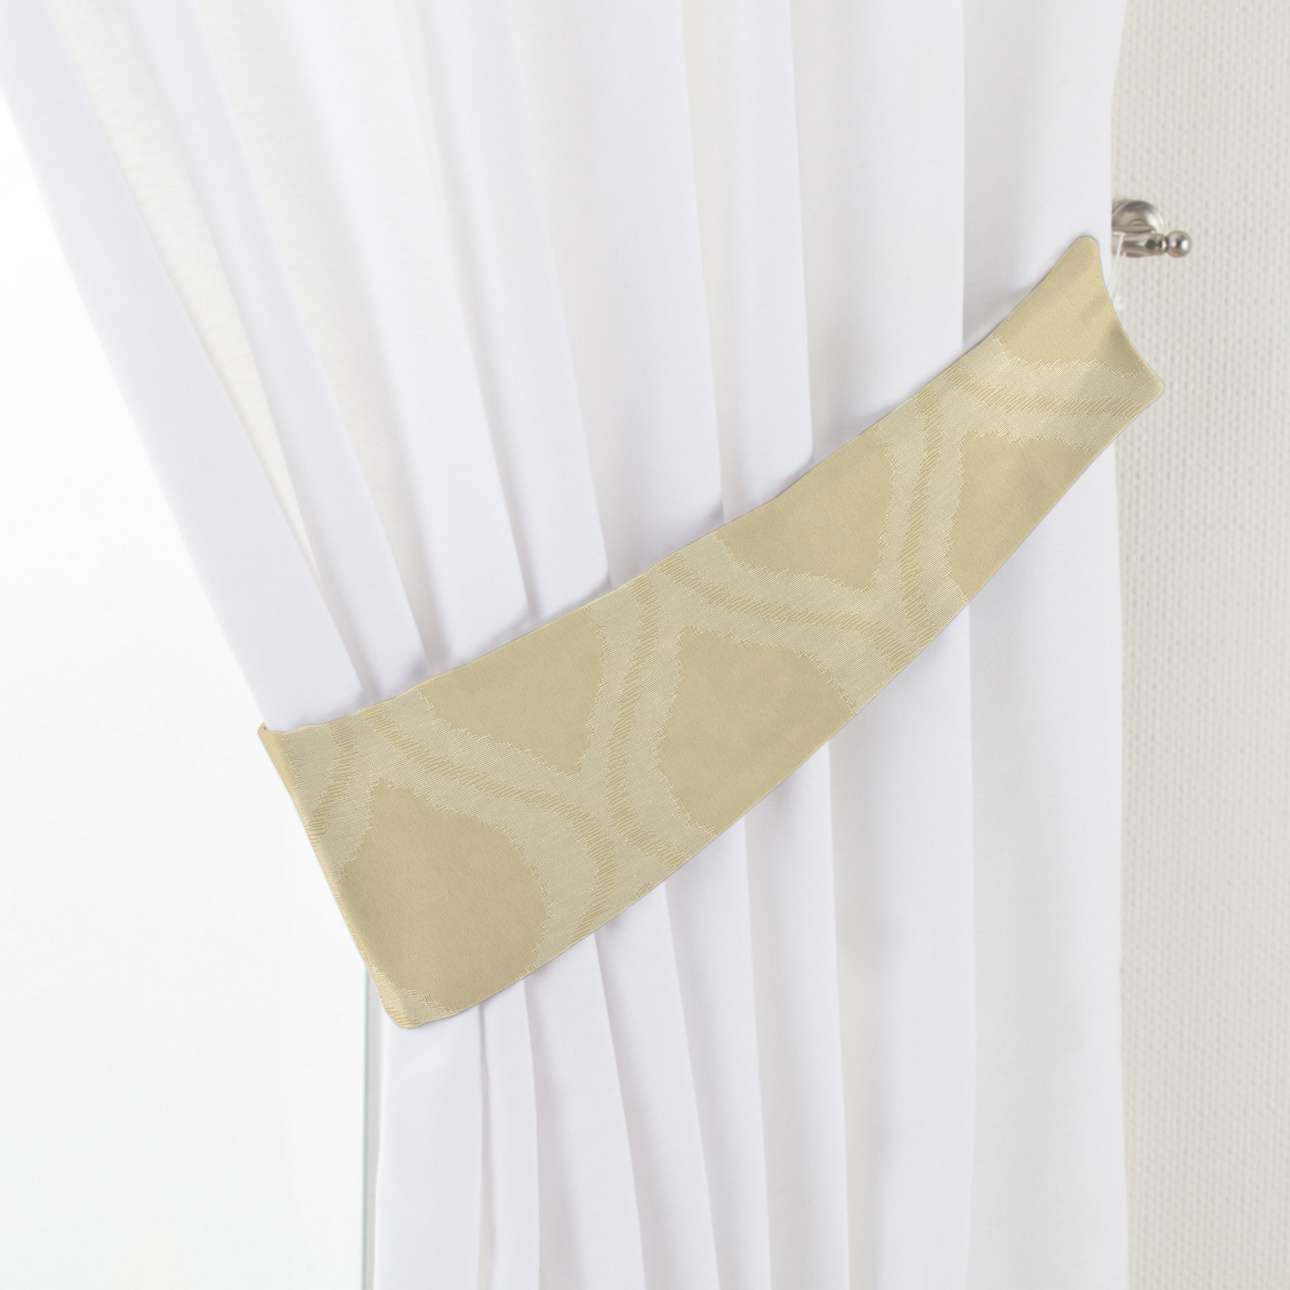 Úchyt Victoria, 1ks V kolekcii Damasco, tkanina: 142-53